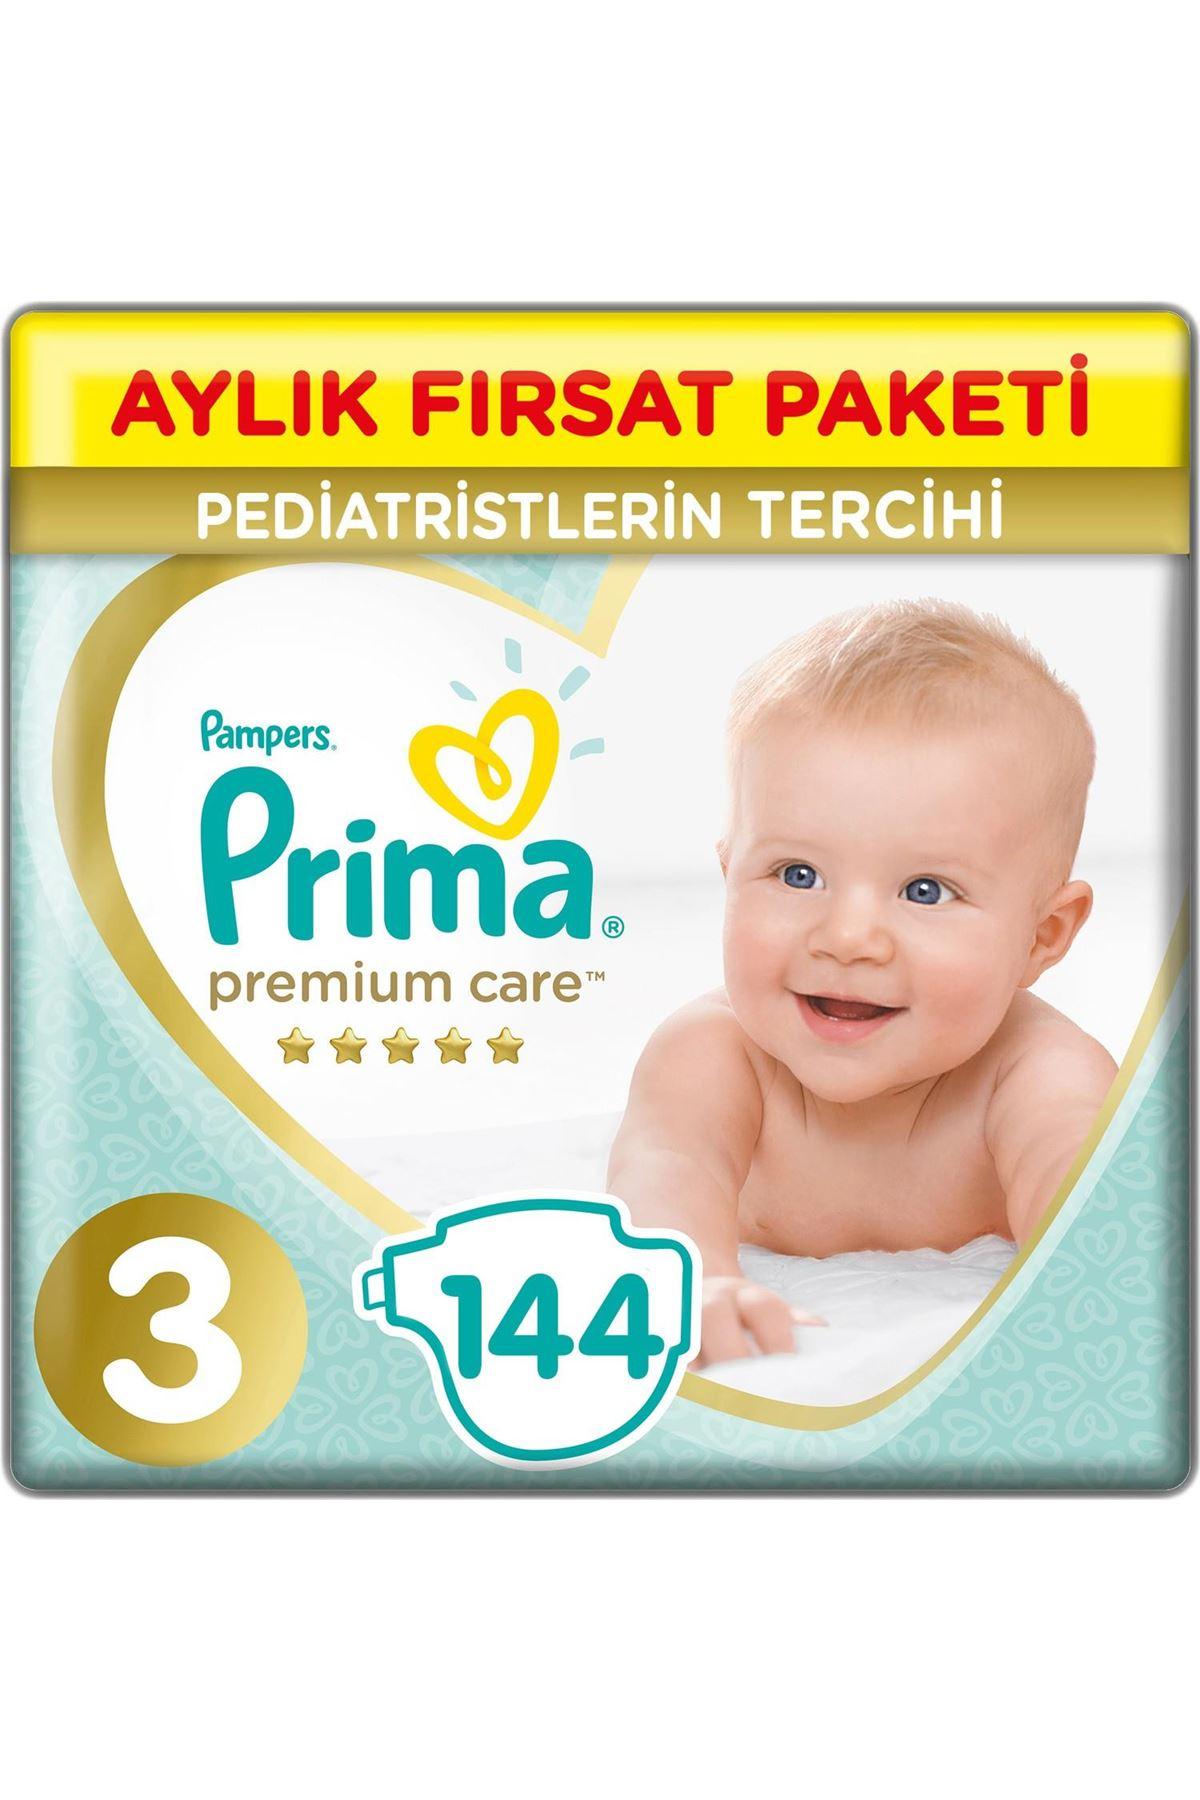 Prima Premium Care Aylık Fırsat Paketi 3 Beden 144 Adet